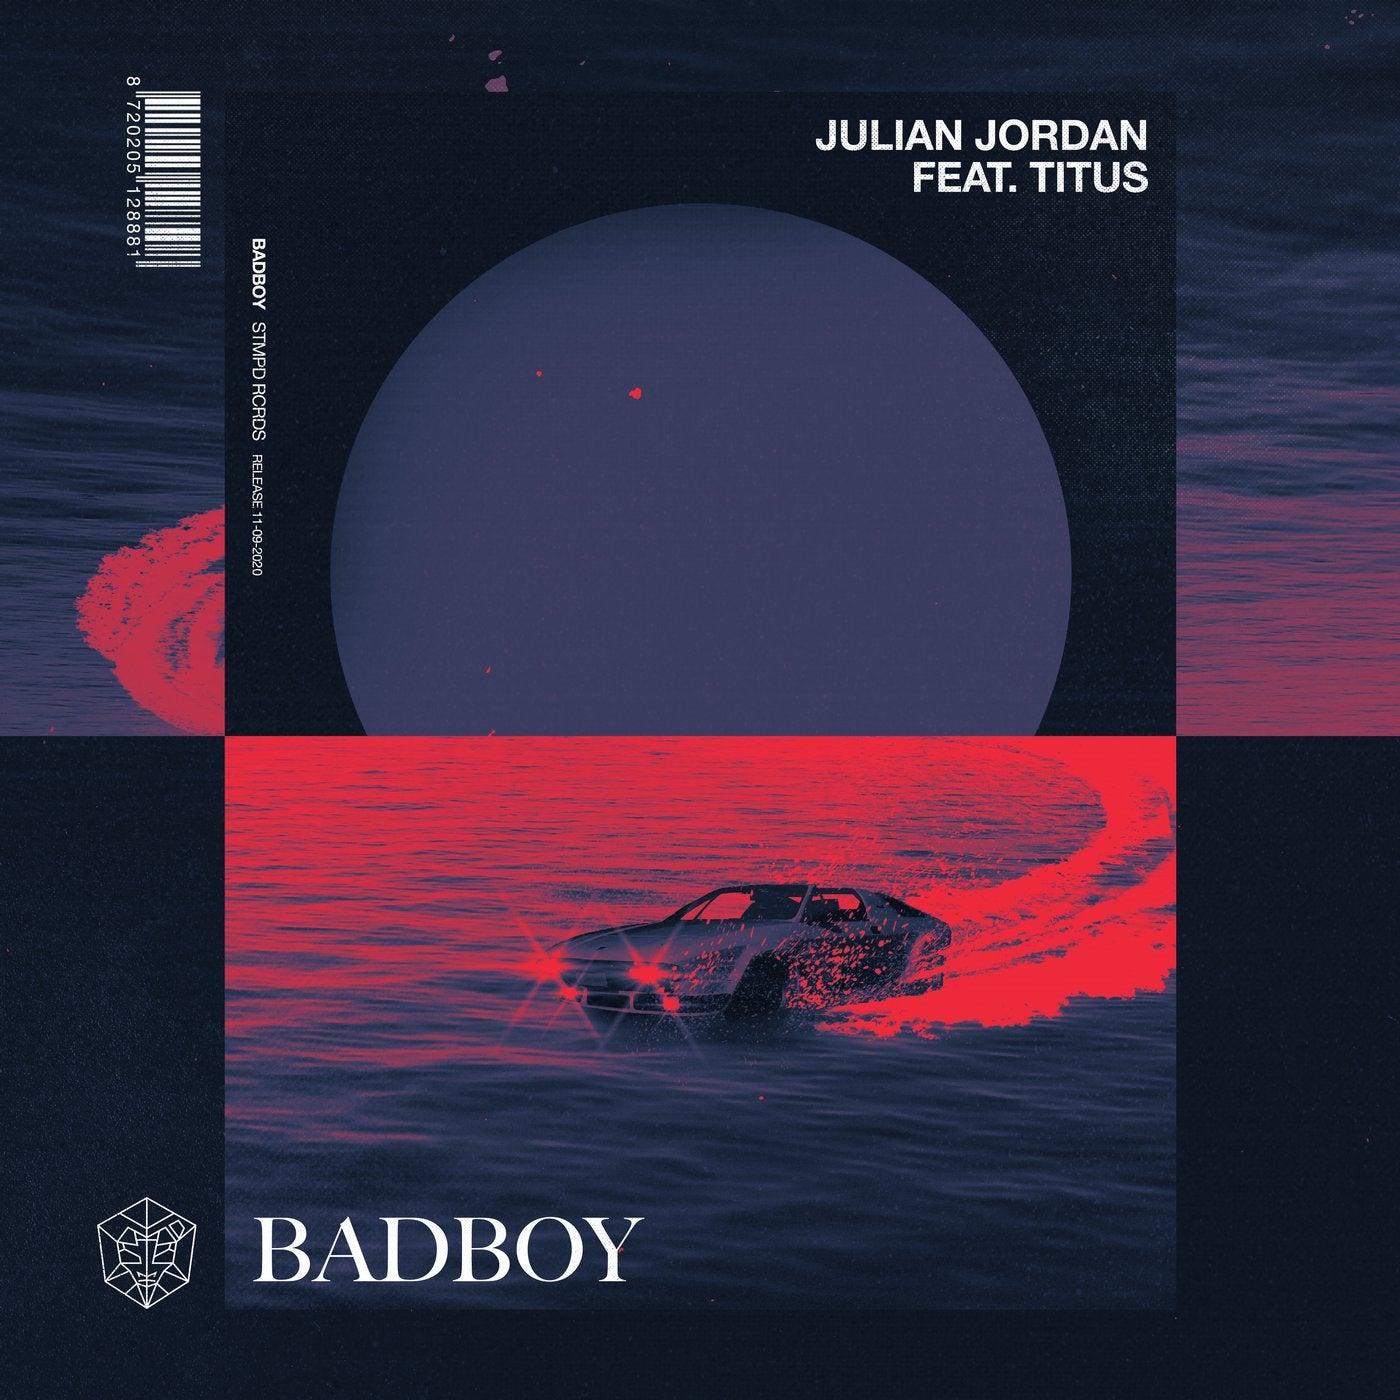 Badboy feat. TITUS (Extended Mix)